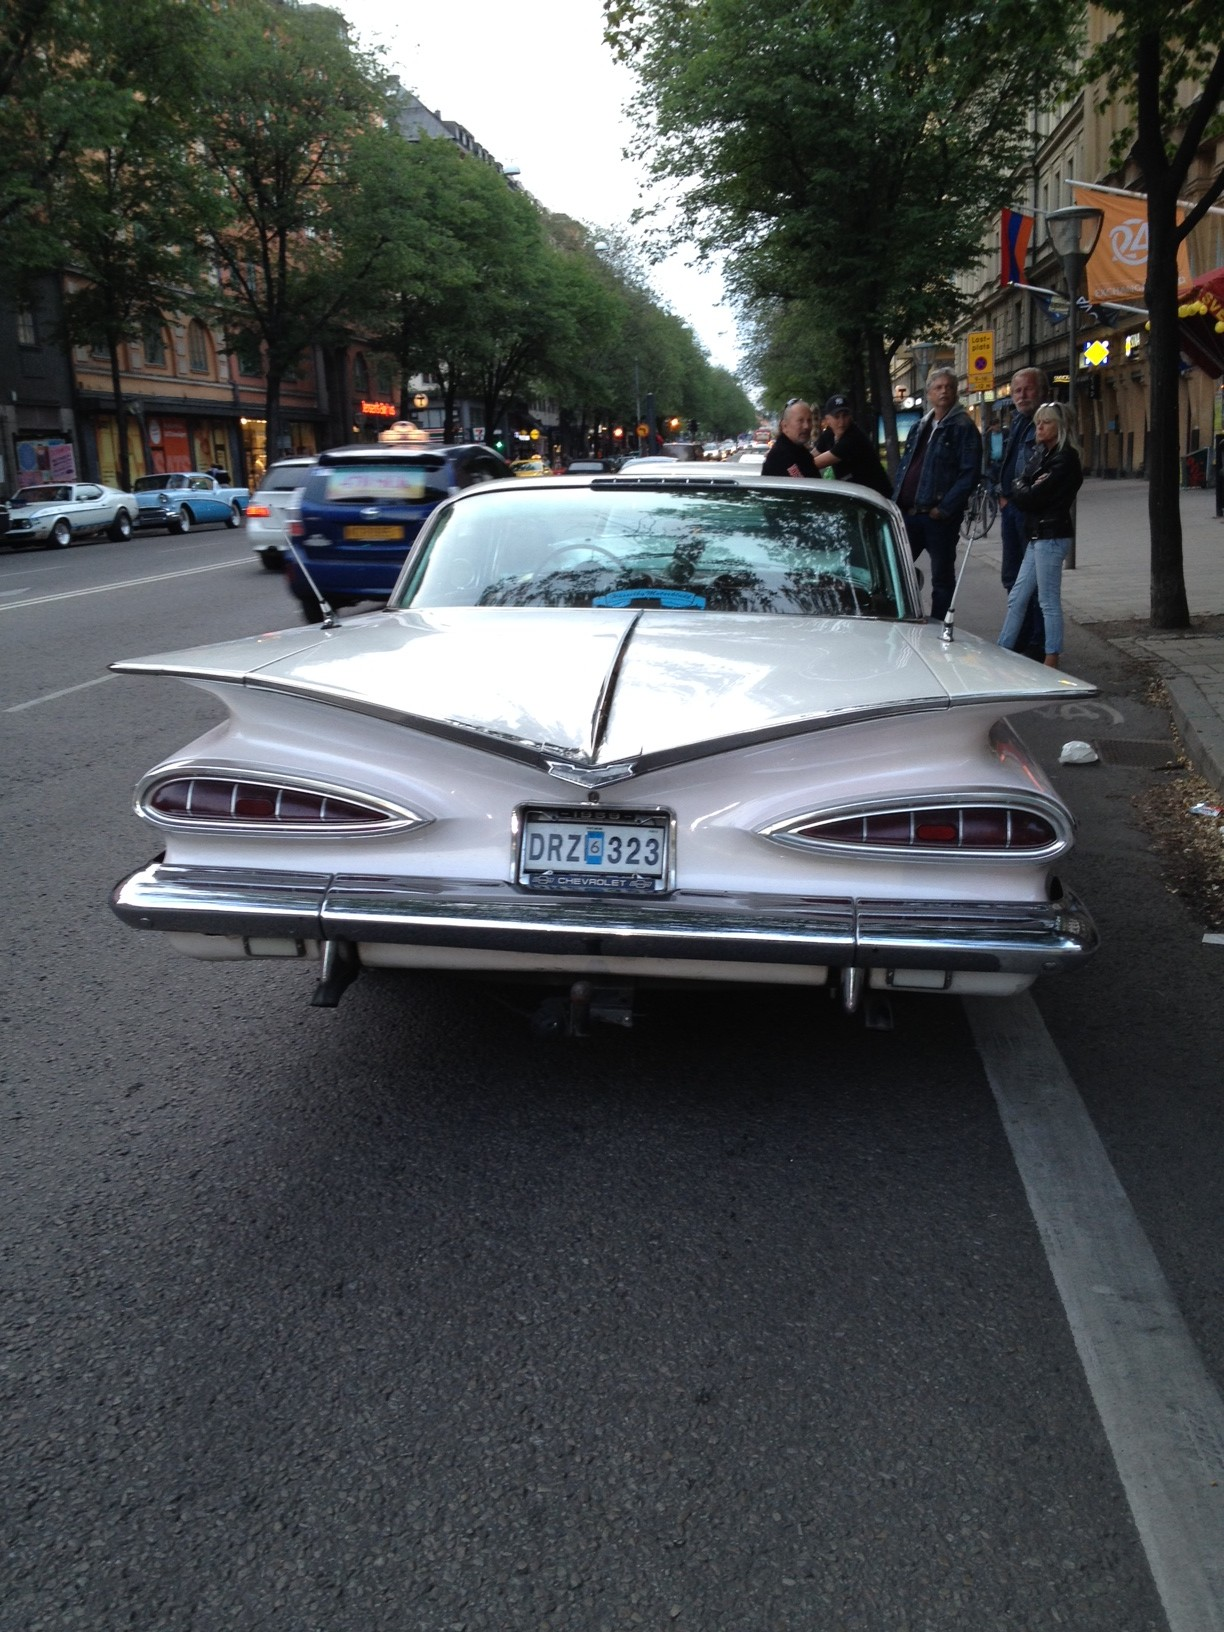 Vintage American car in Stockholm